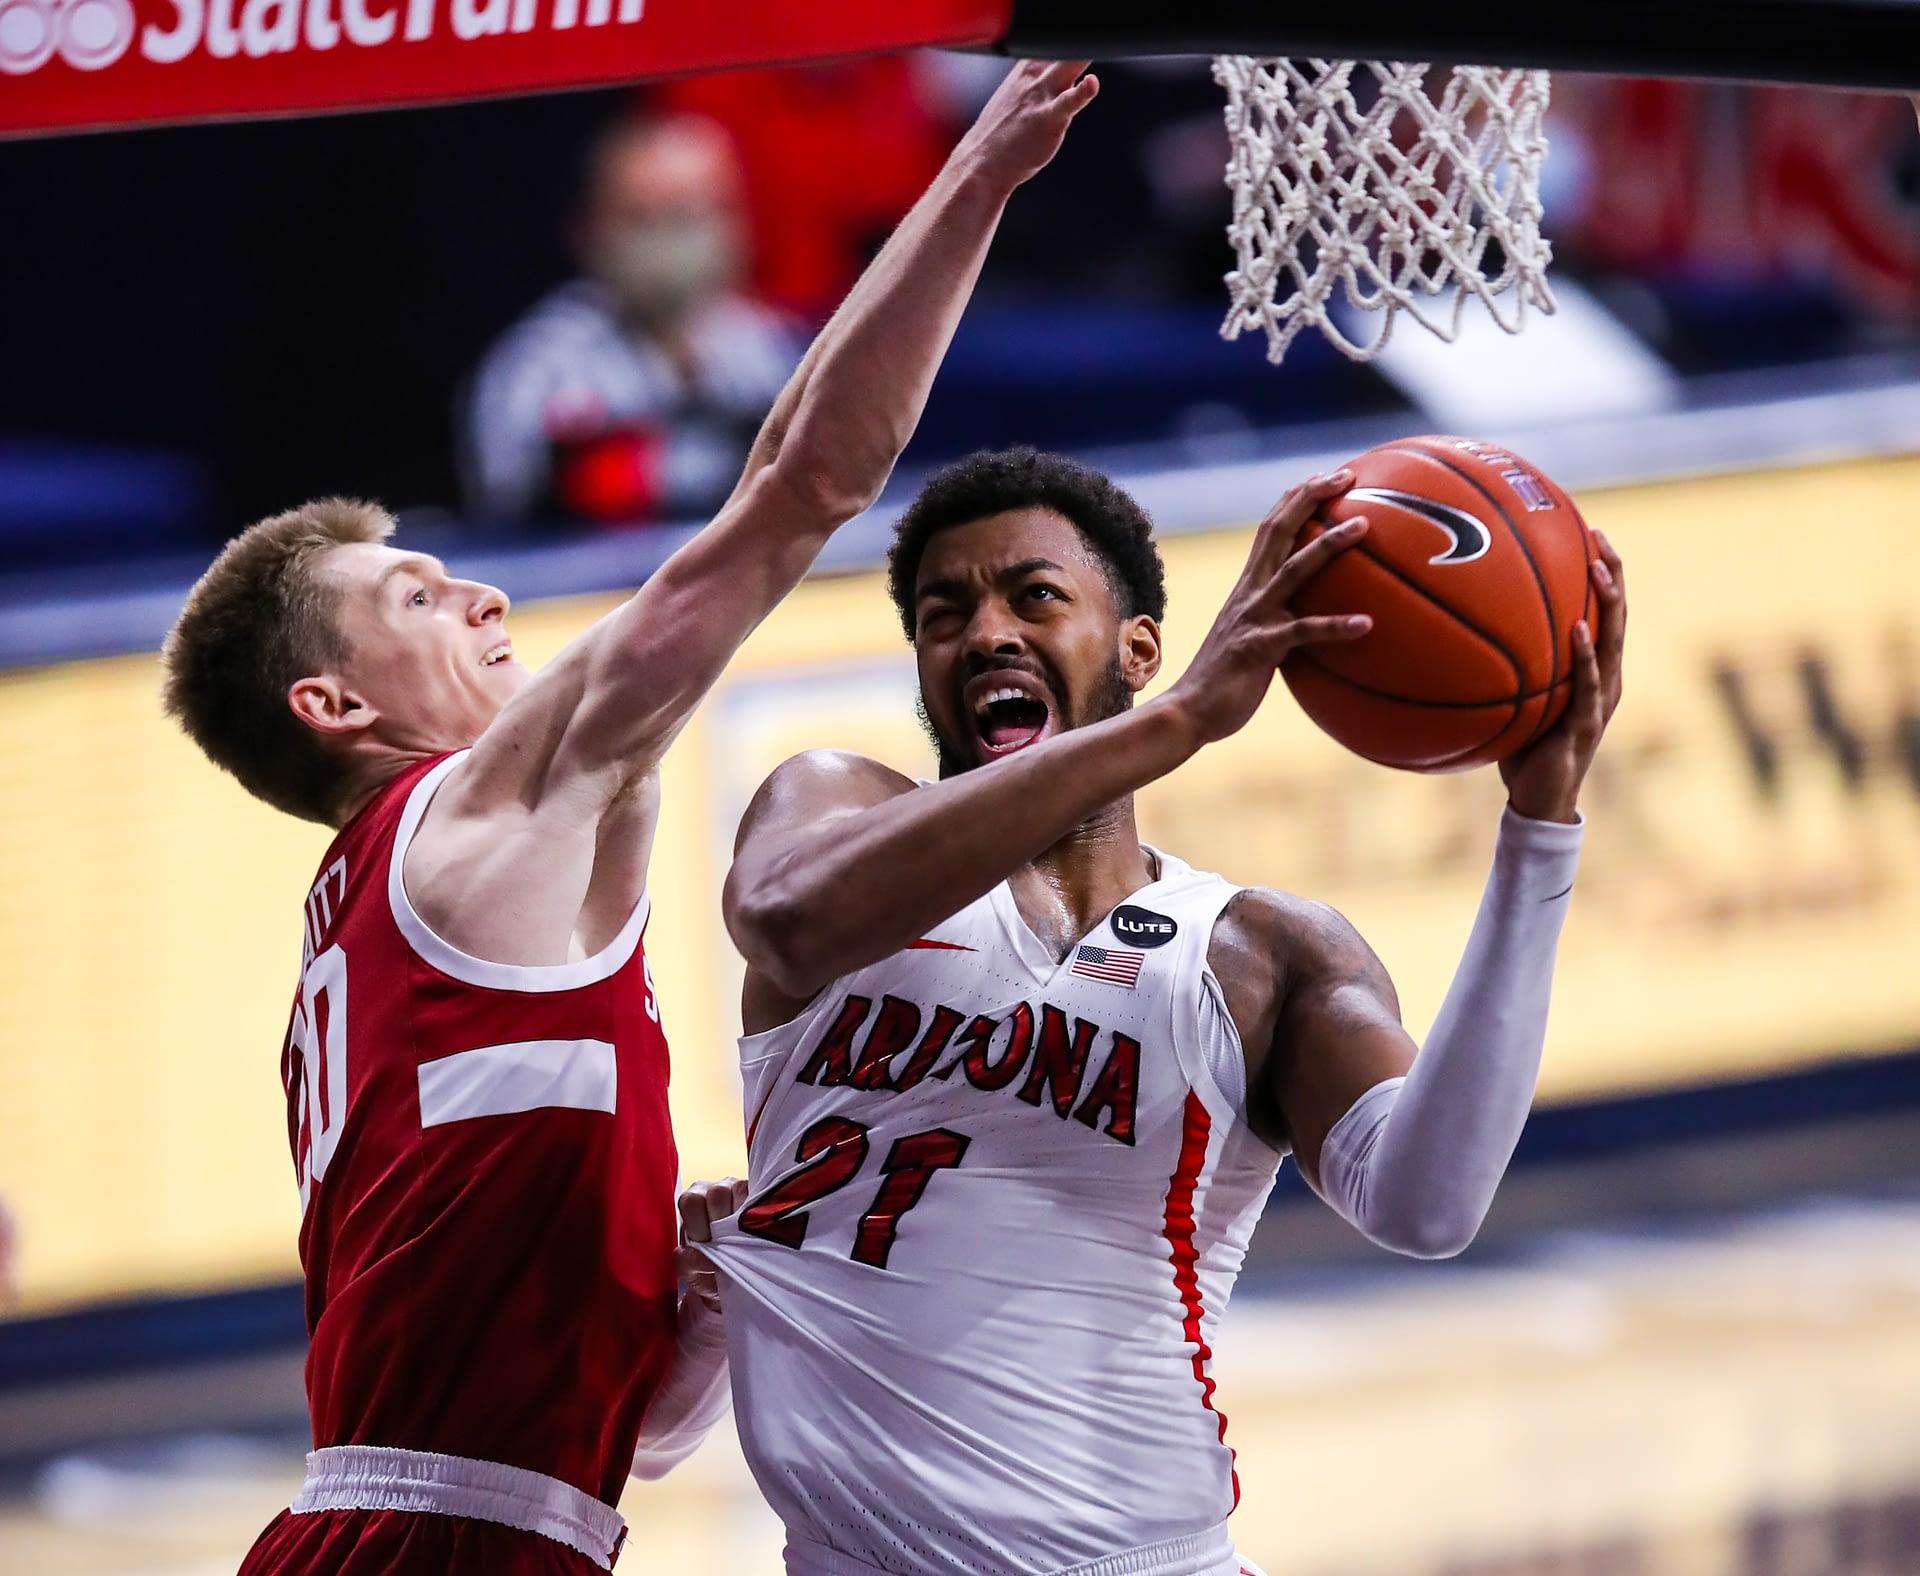 Jordan-Brown-Stanford